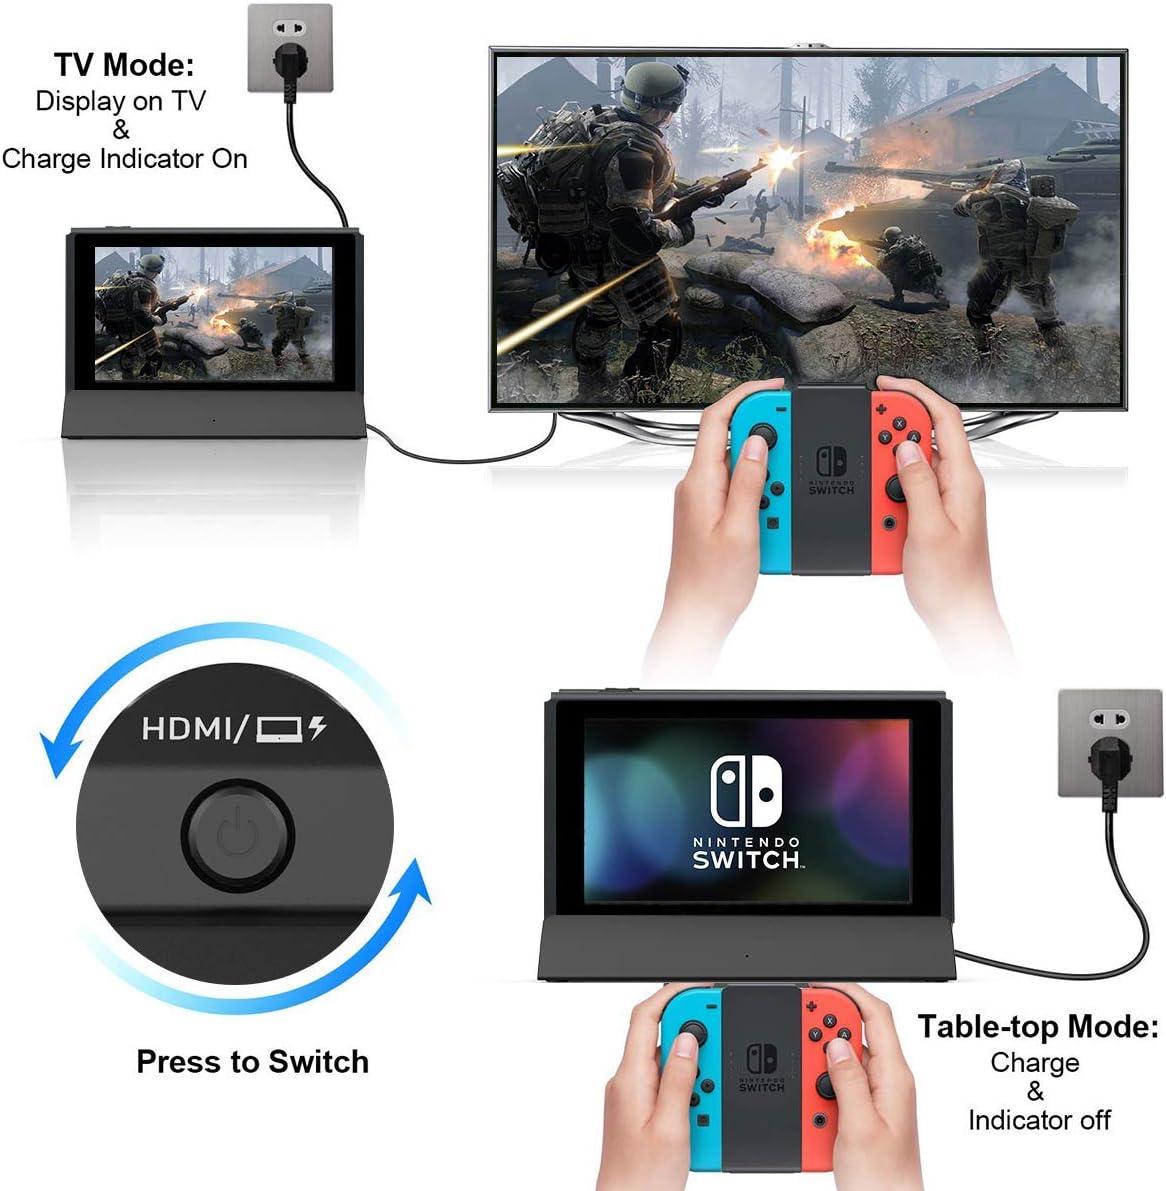 Repuesto para Nintendo Switch Dock, VOGEK TV Dock Station Portable Charging Docking Playstand para Nintendo Switch Charge and Play con Type C a HDMI TV Adapter, USB 3.0 2.0 (Enewed): Amazon.es: Electrónica